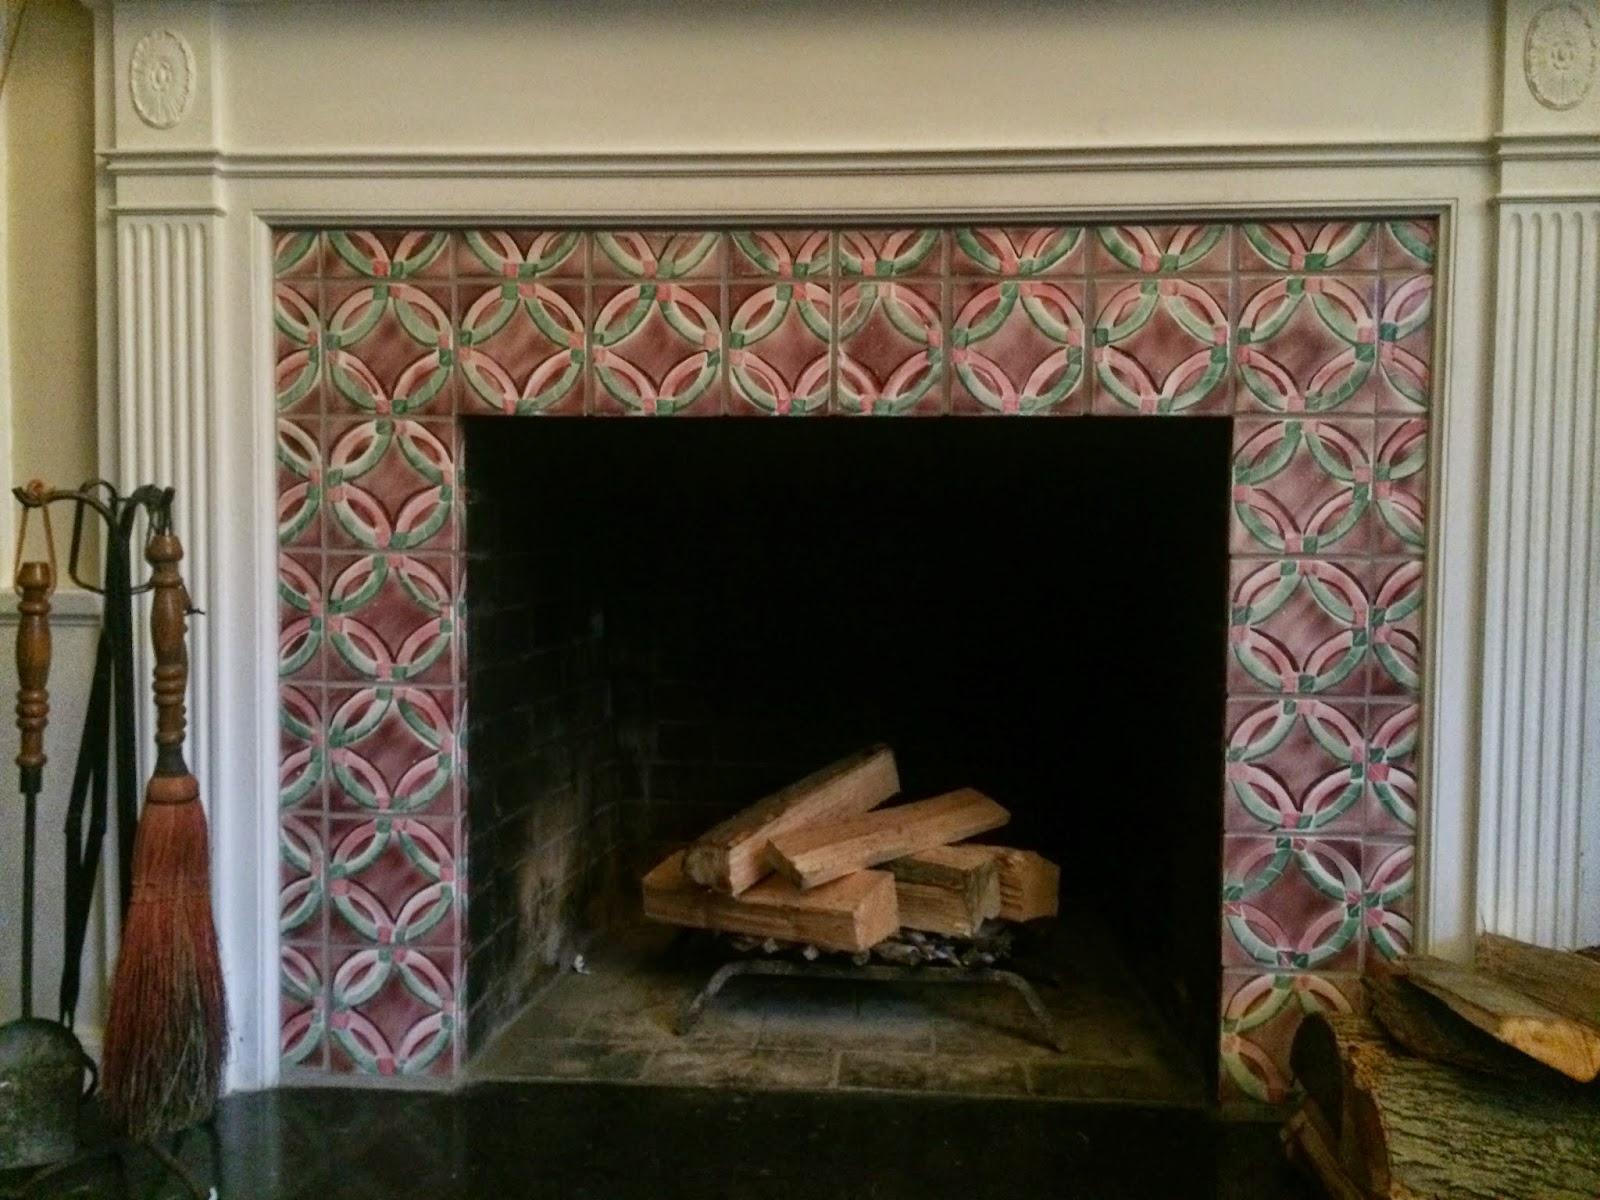 Finest Amish Quilt Pattern Ceramic Tile Fireplace Surround Jn56